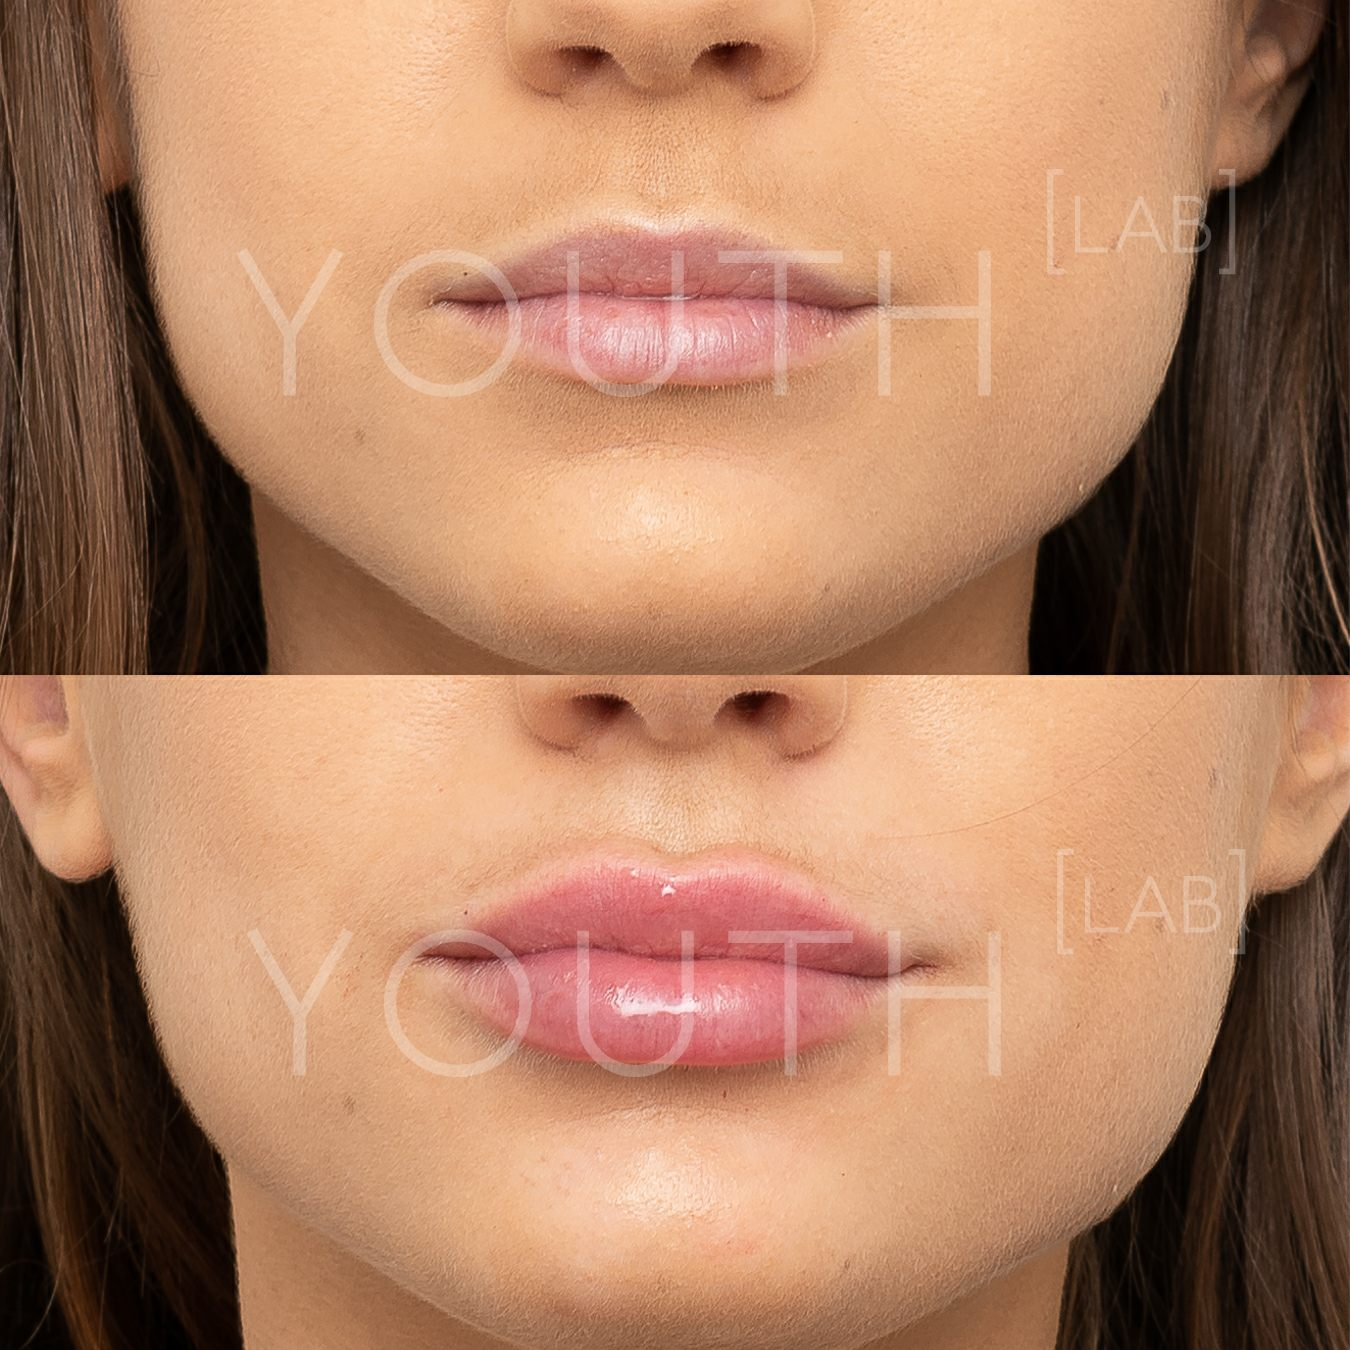 Consented - VA - lips B&A 3.jpg